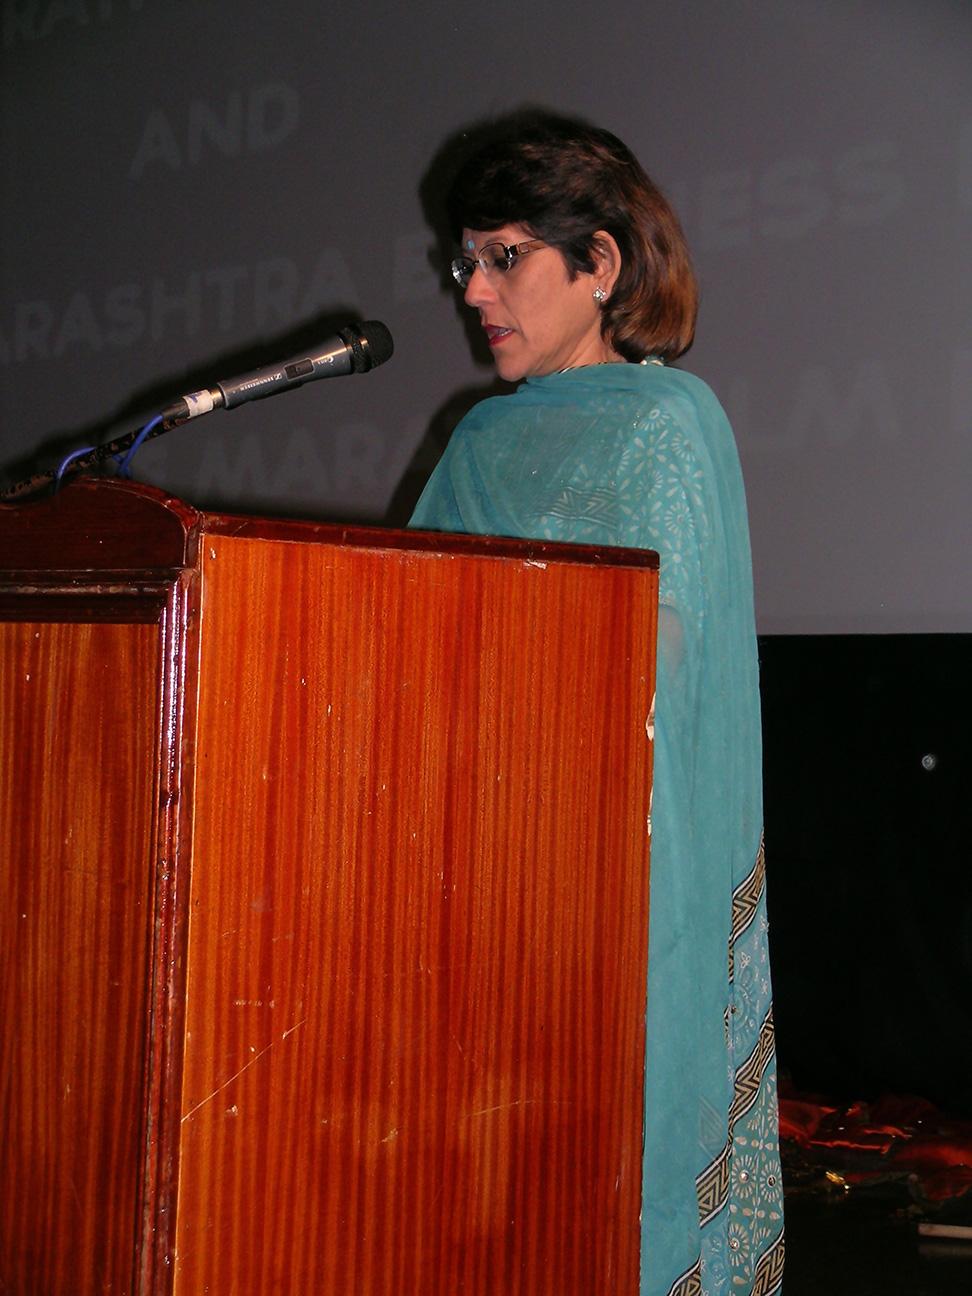 Mrs.Rameyad - Director of Mauritius Film Development Corp.